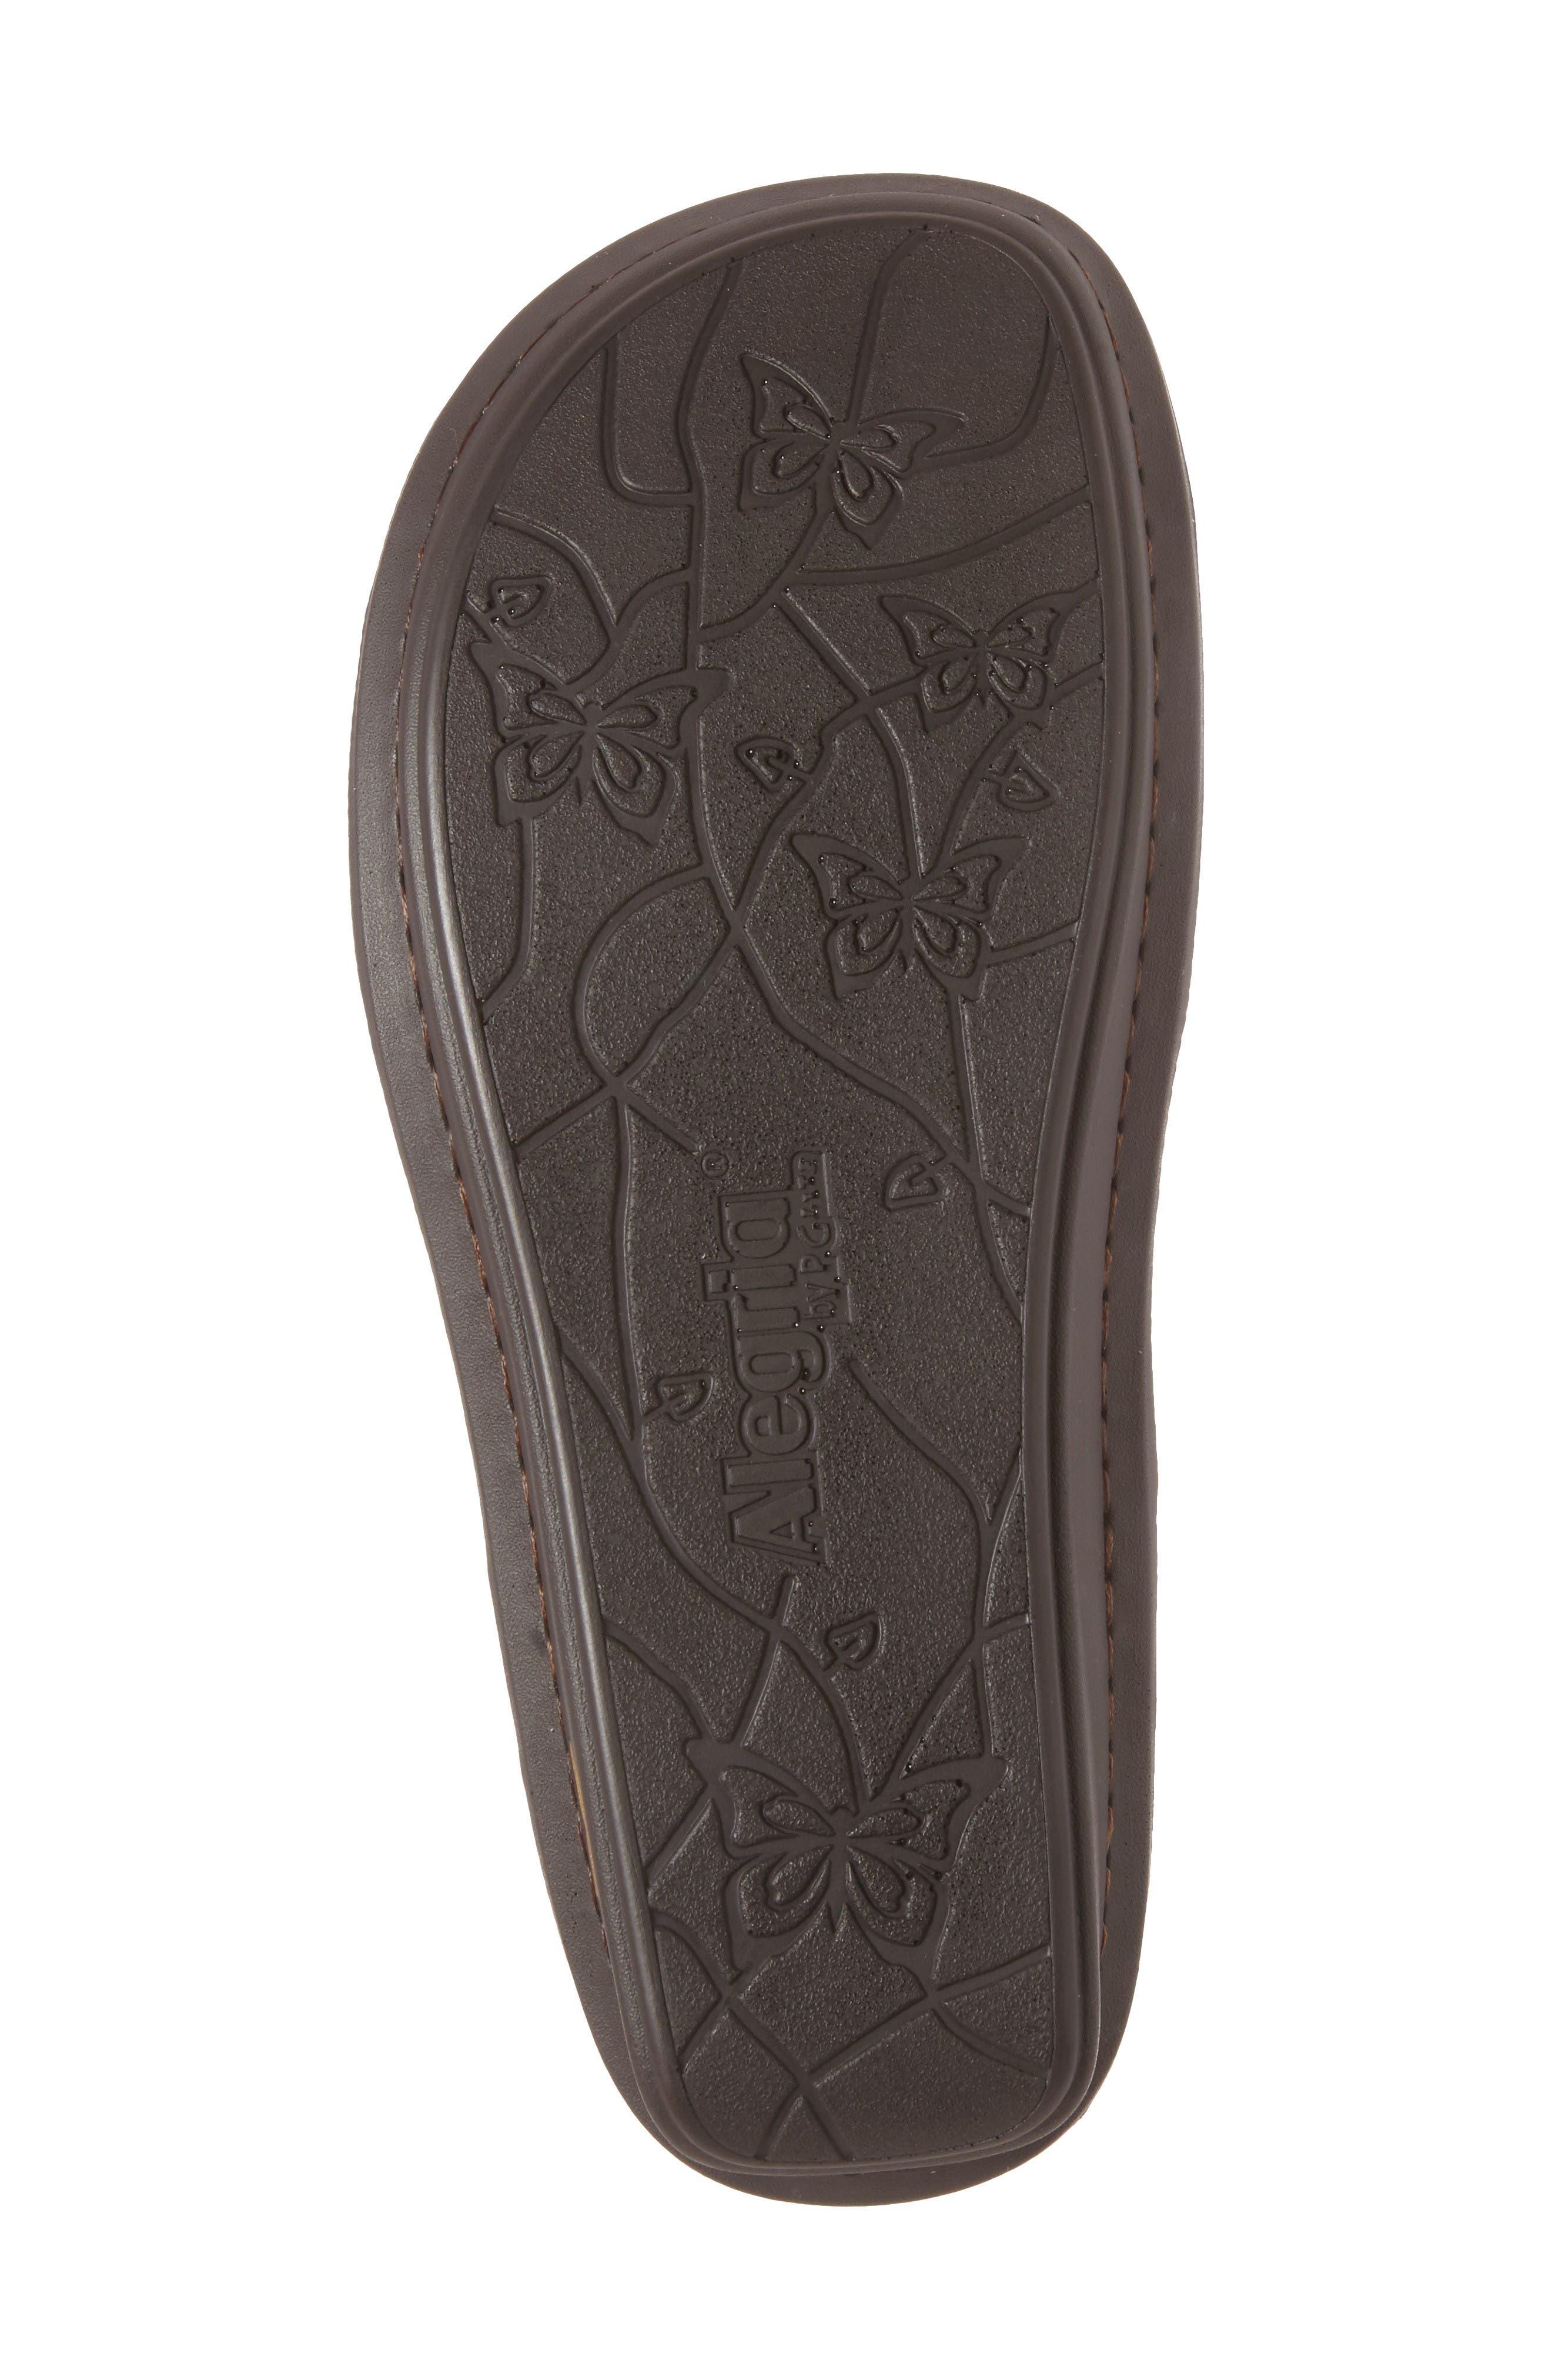 Viki Embroidered Sandal,                             Alternate thumbnail 4, color,                             Cognac Pins/ Needles Leather